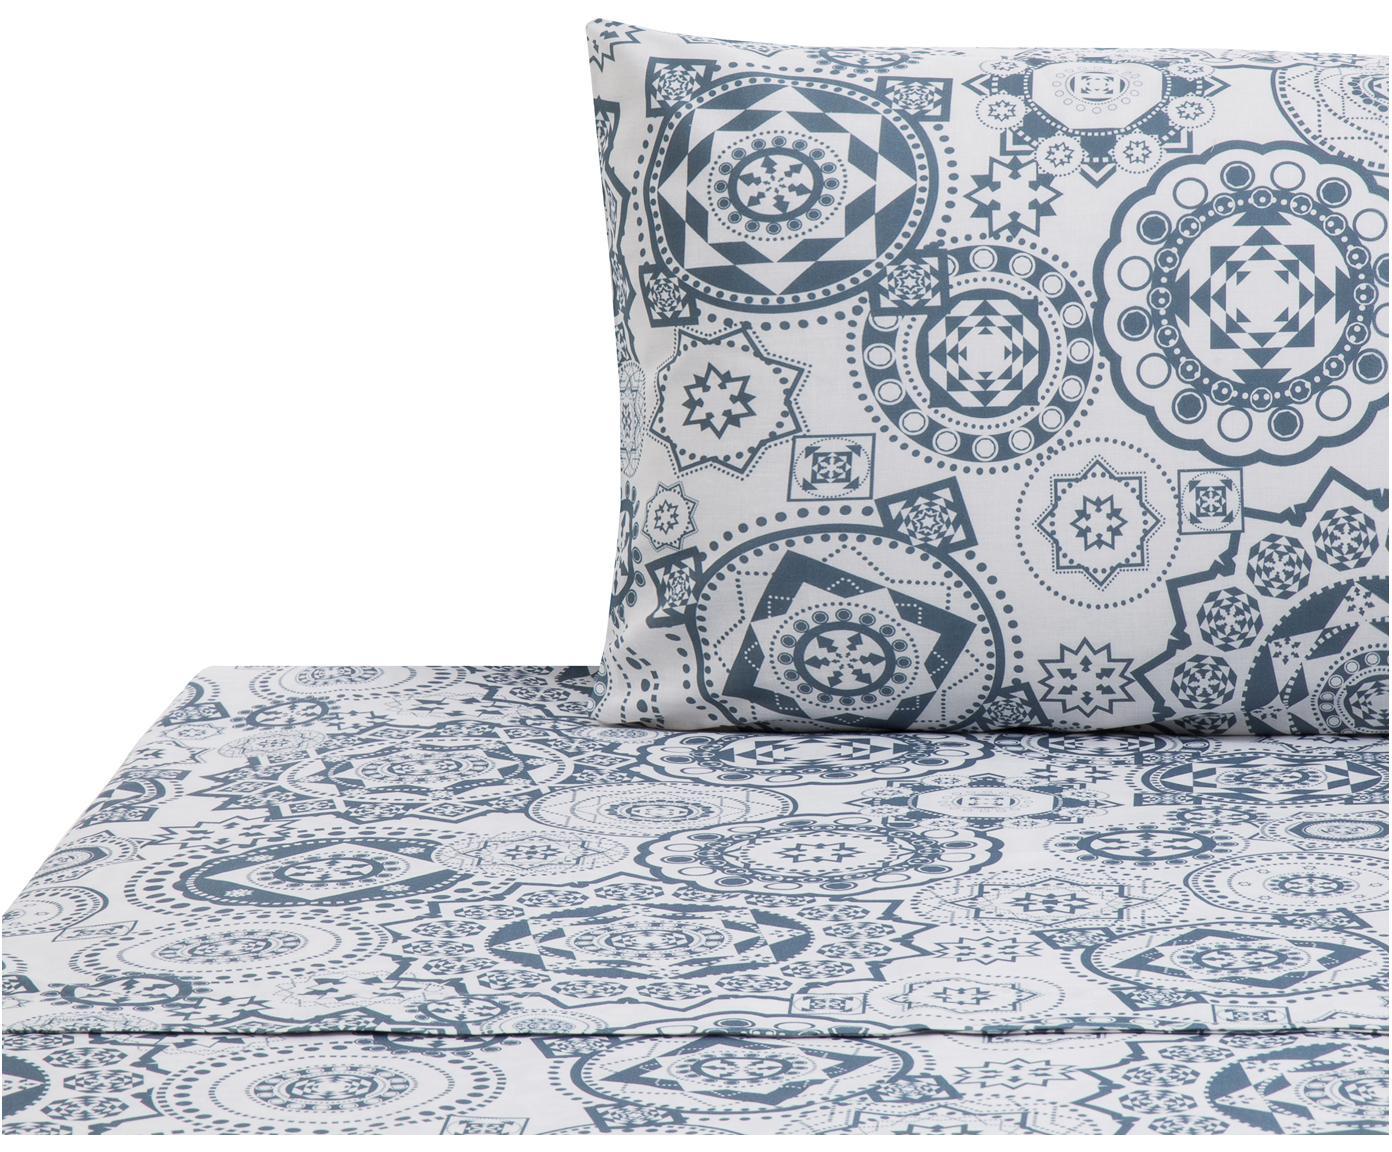 Set lenzuola in cotone Morris 2 pz, Cotone, Fronte: blu, bianco Retro: bianco, 160 x 270 cm